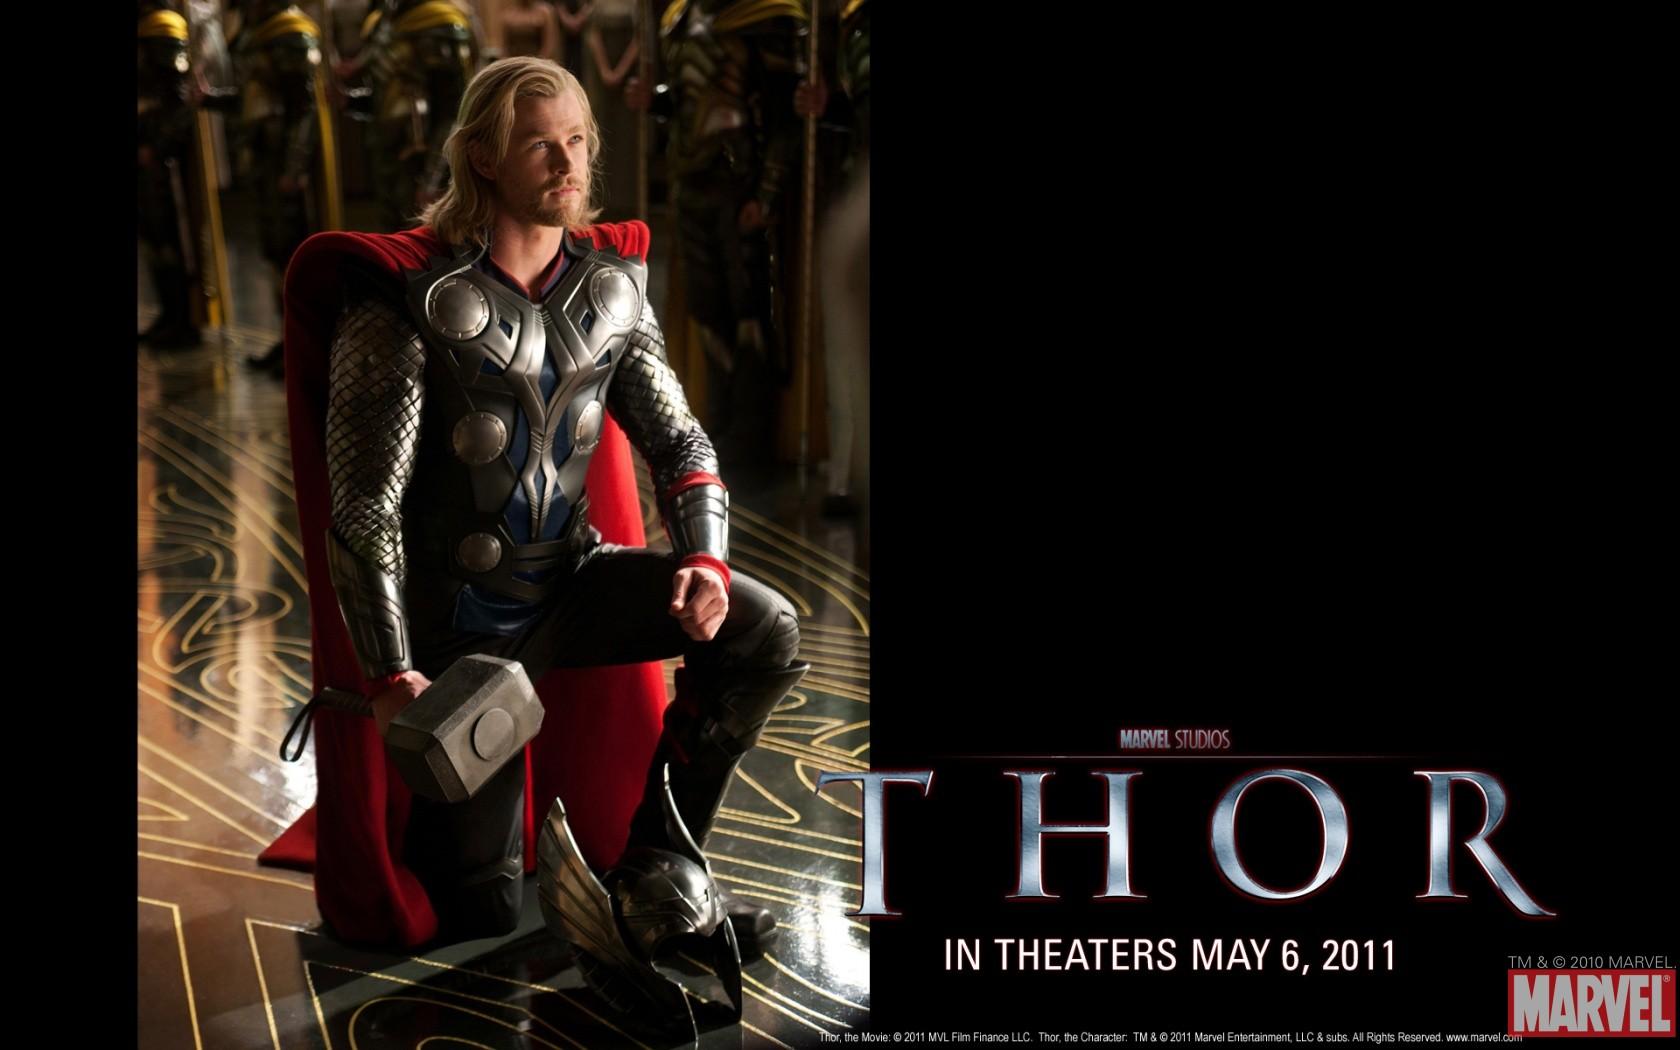 Wonderful Wallpaper Marvel Thor - wallpaper_xlarge  2018_933090.jpg